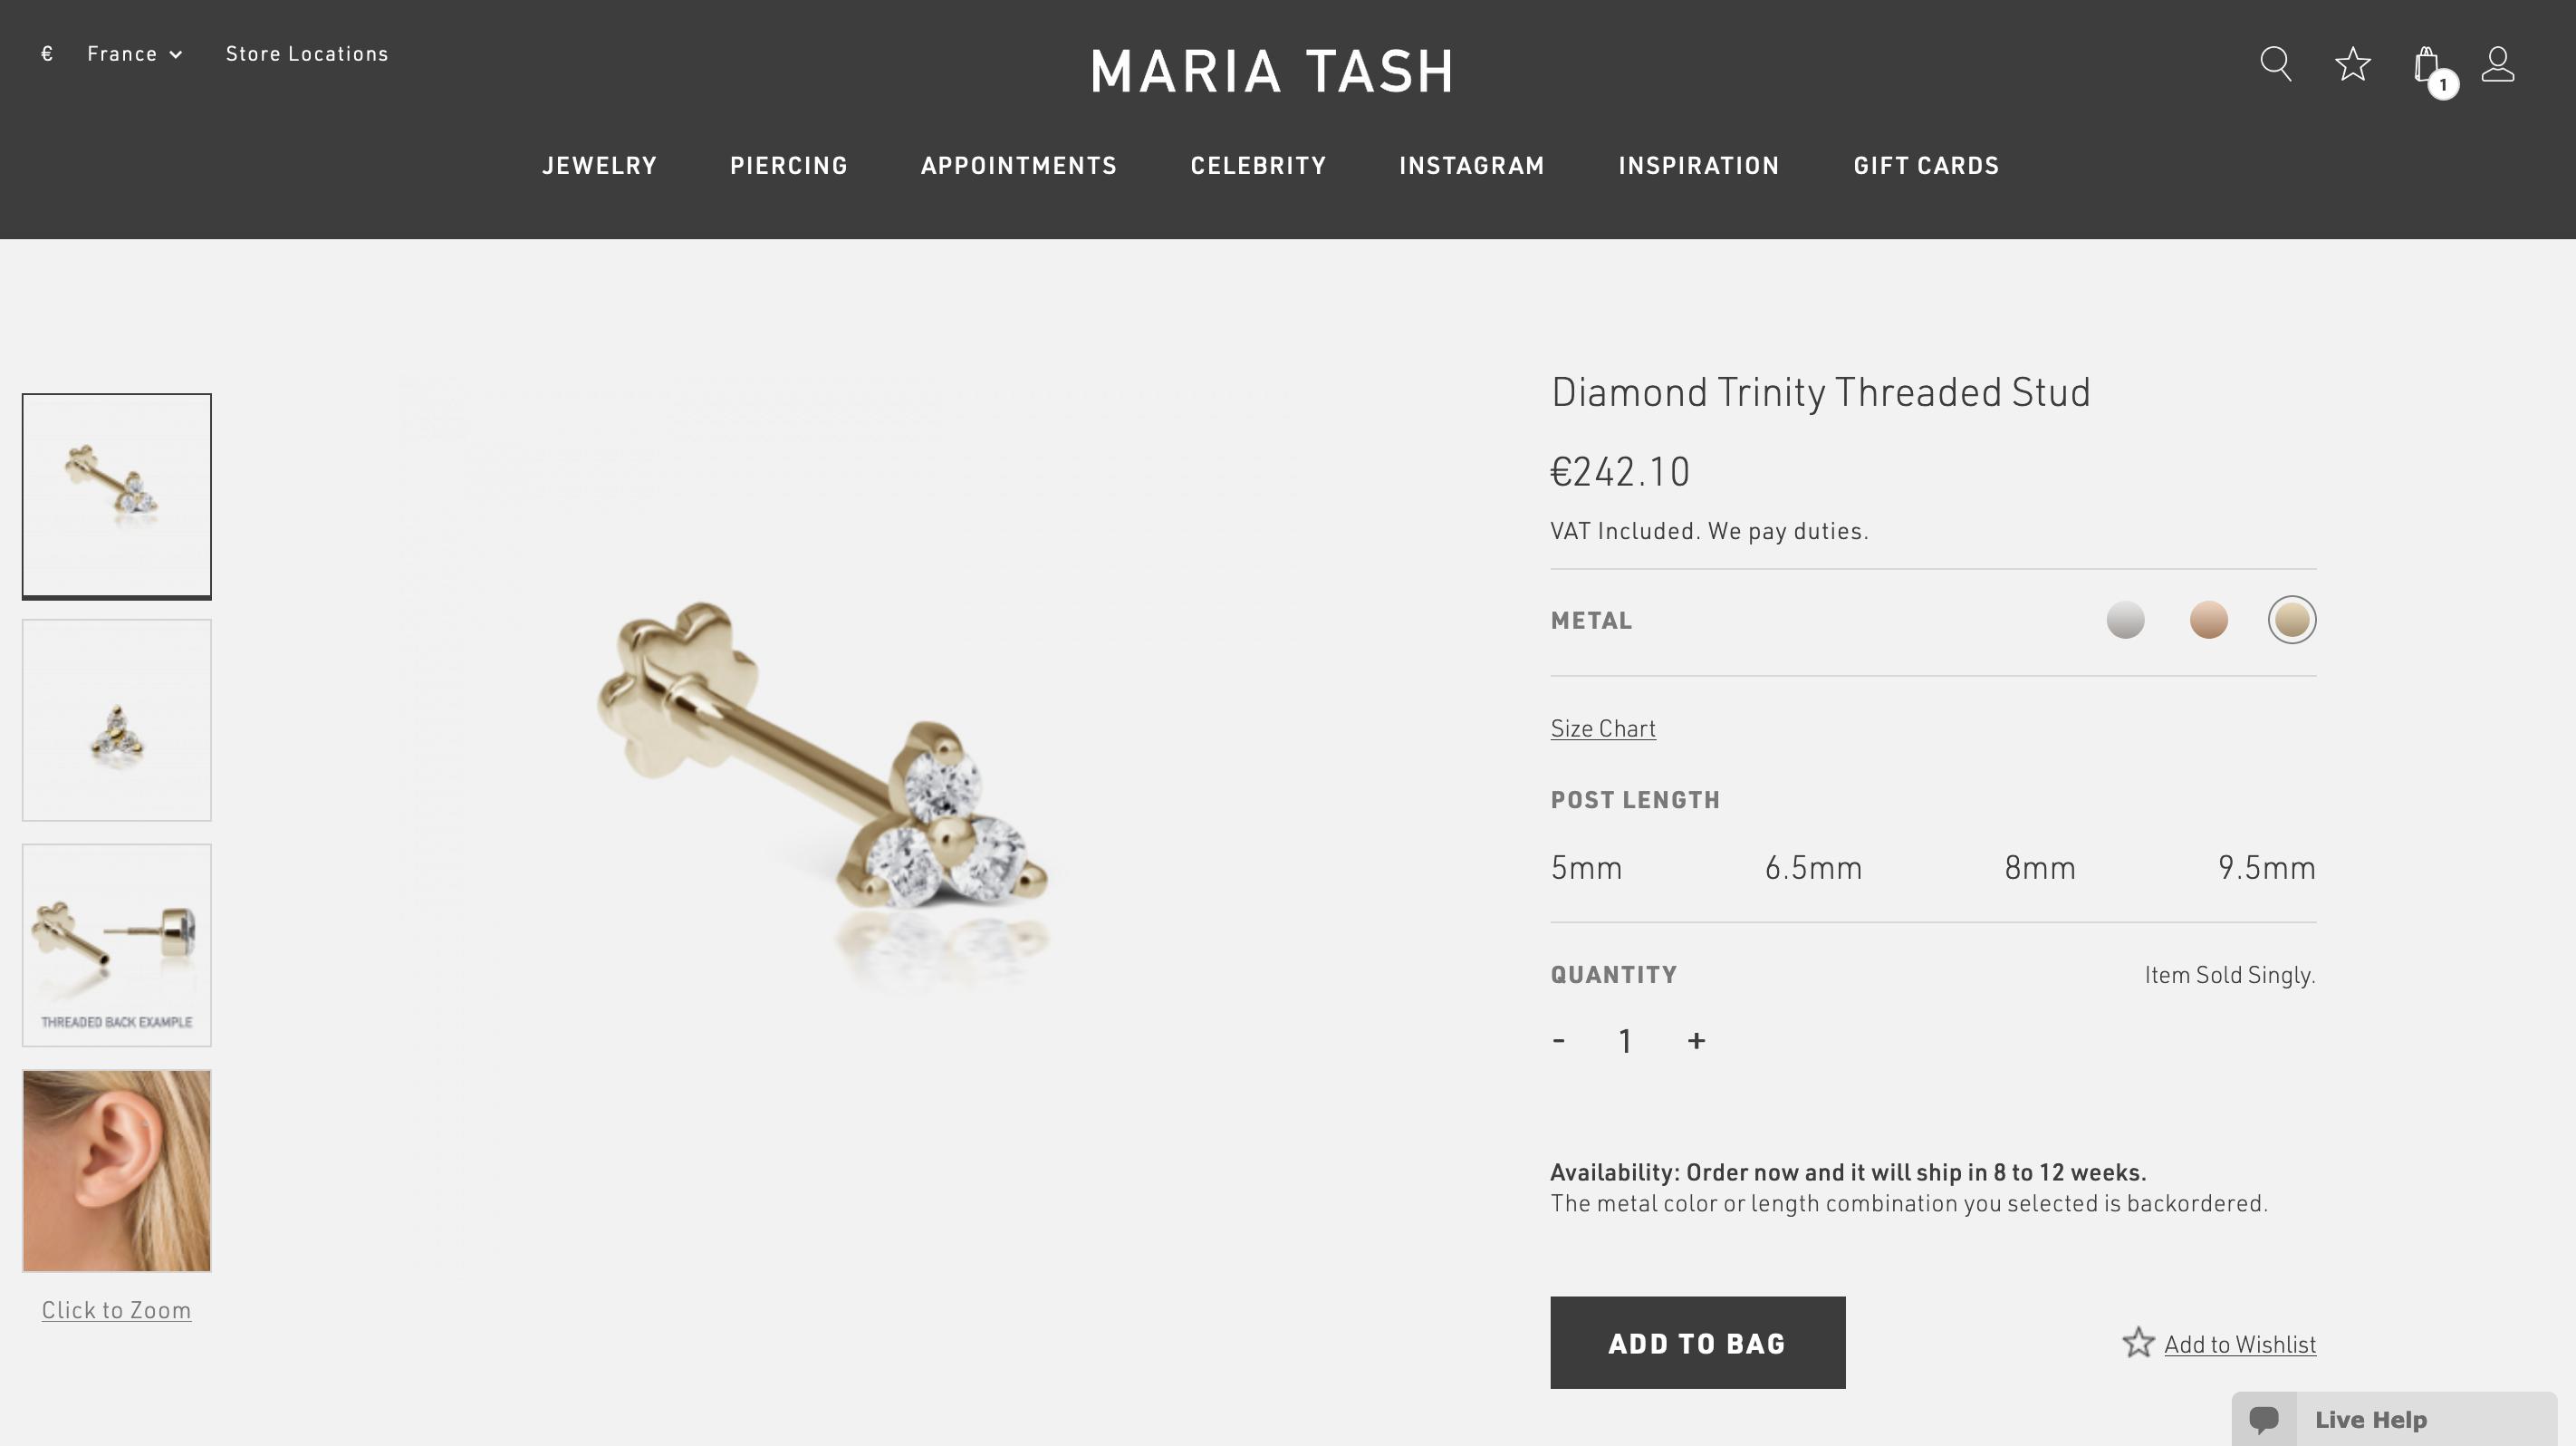 Anzahlung Gianna Custom Order Maria Tash